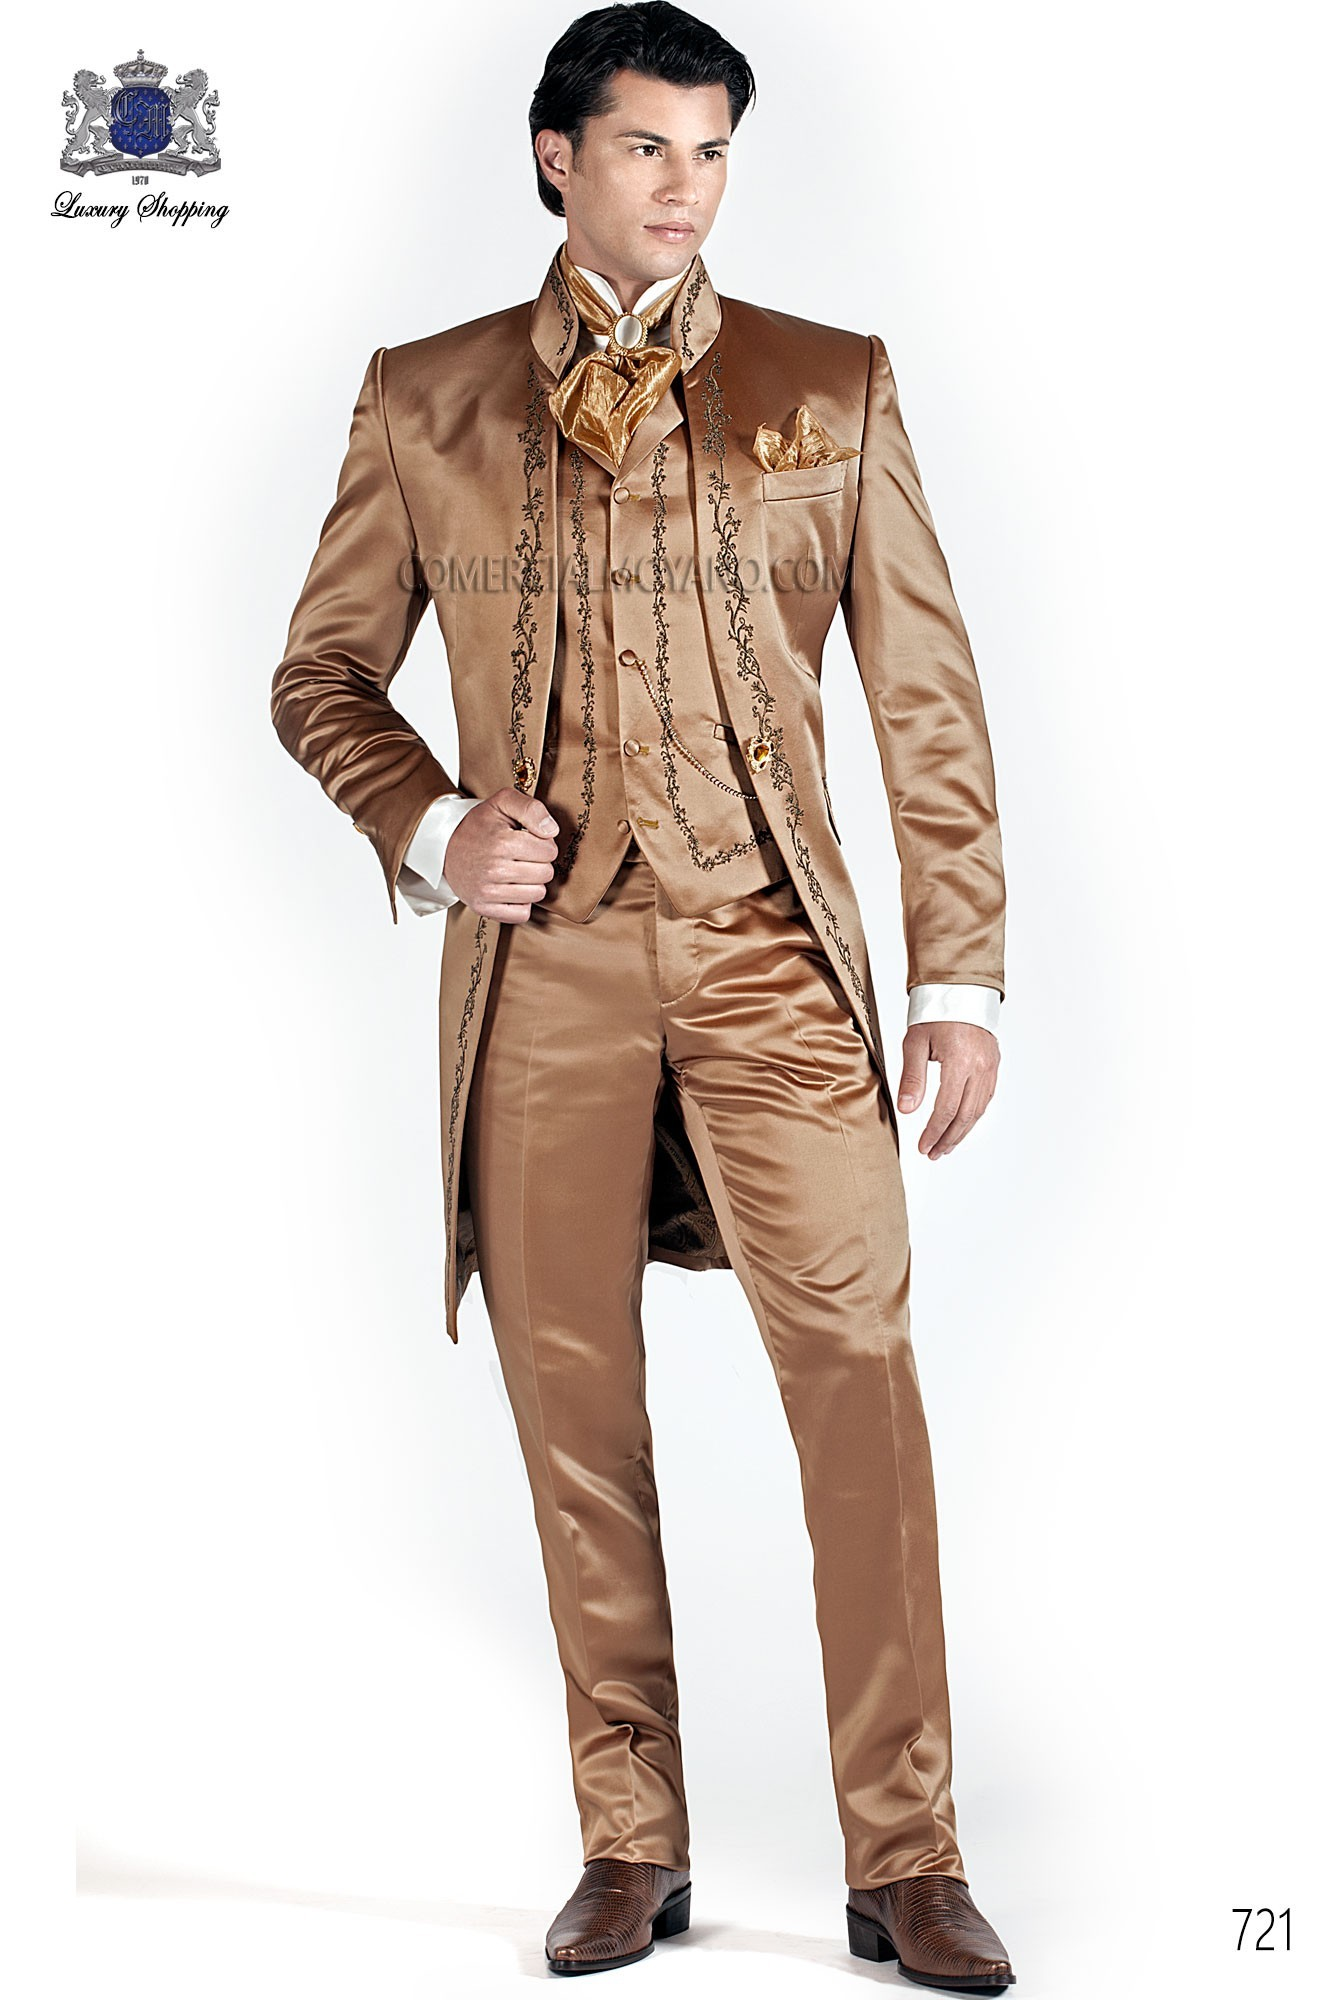 Baroque gold-tone men wedding suit, model: 721 Ottavio Nuccio Gala ...